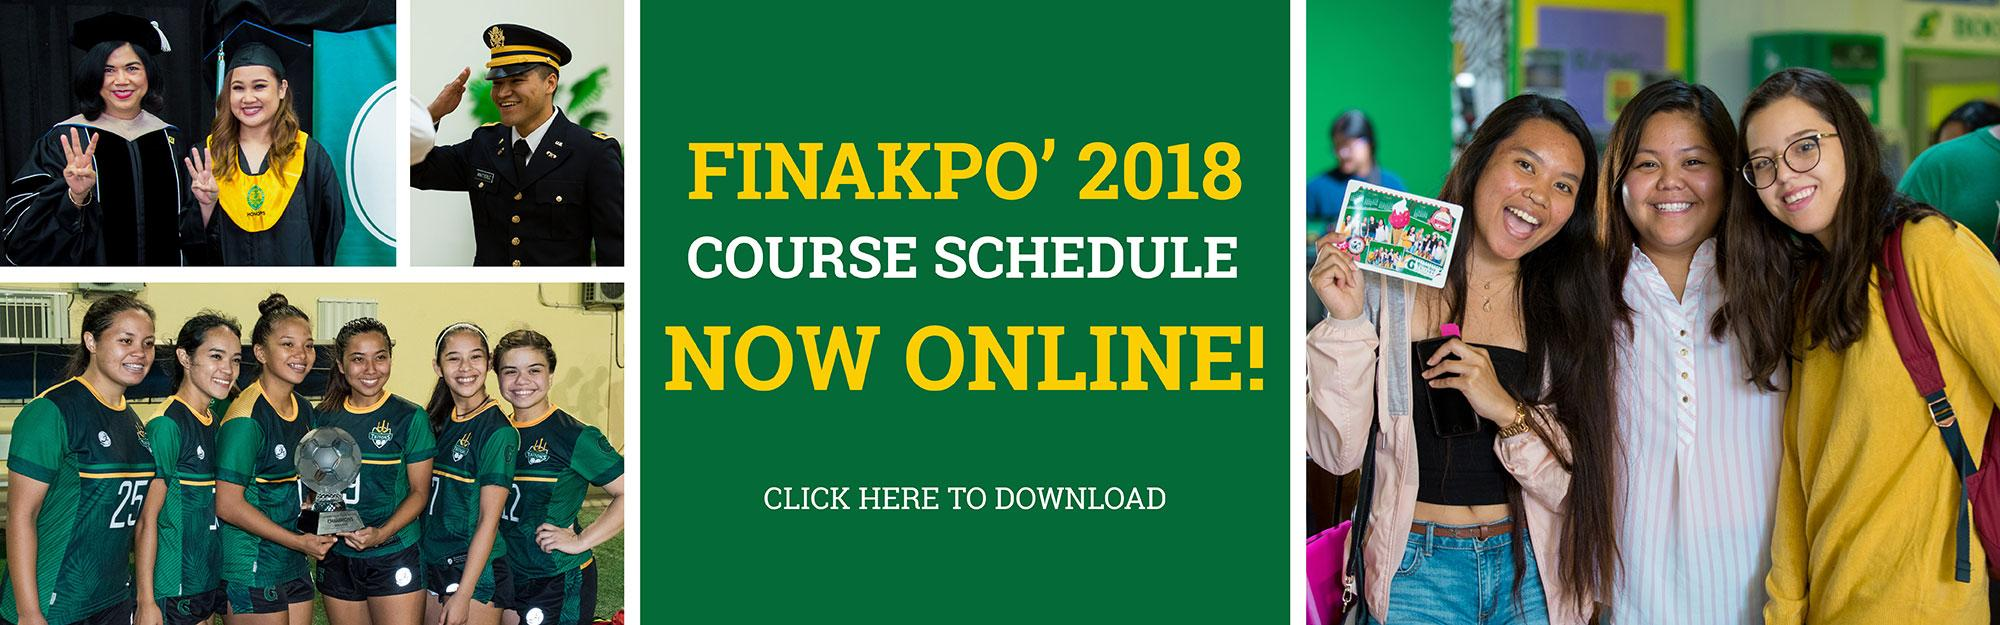 Finakpo 2018 Course Schedule